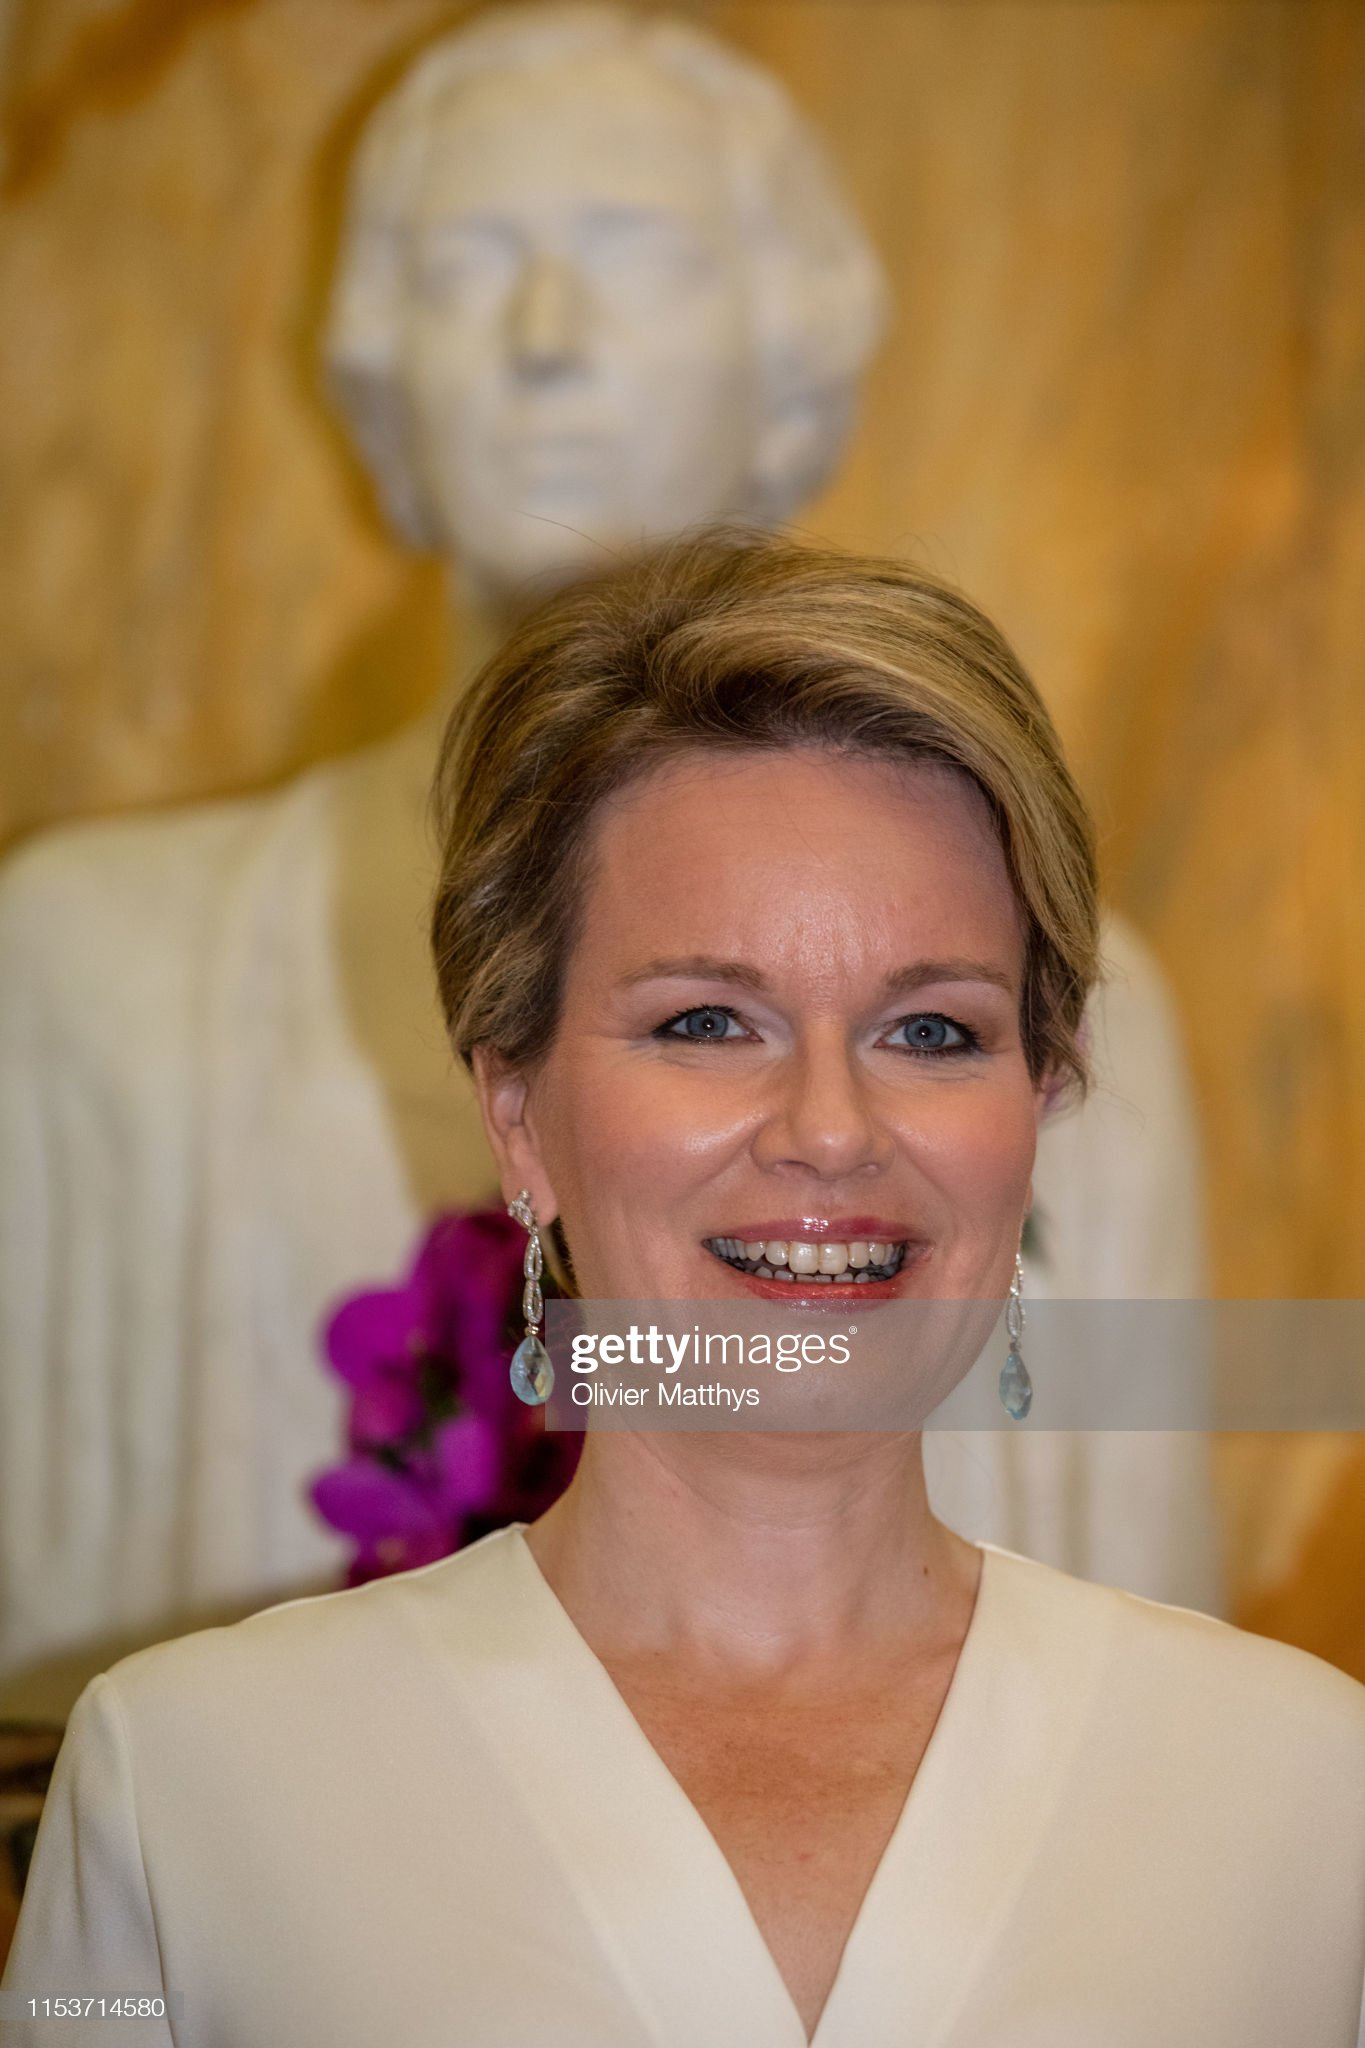 Вечерние наряды Королевы Матильды Queen Mathilde Of Belgium Attends International Music Concurs At Bozar In Brussels : News Photo